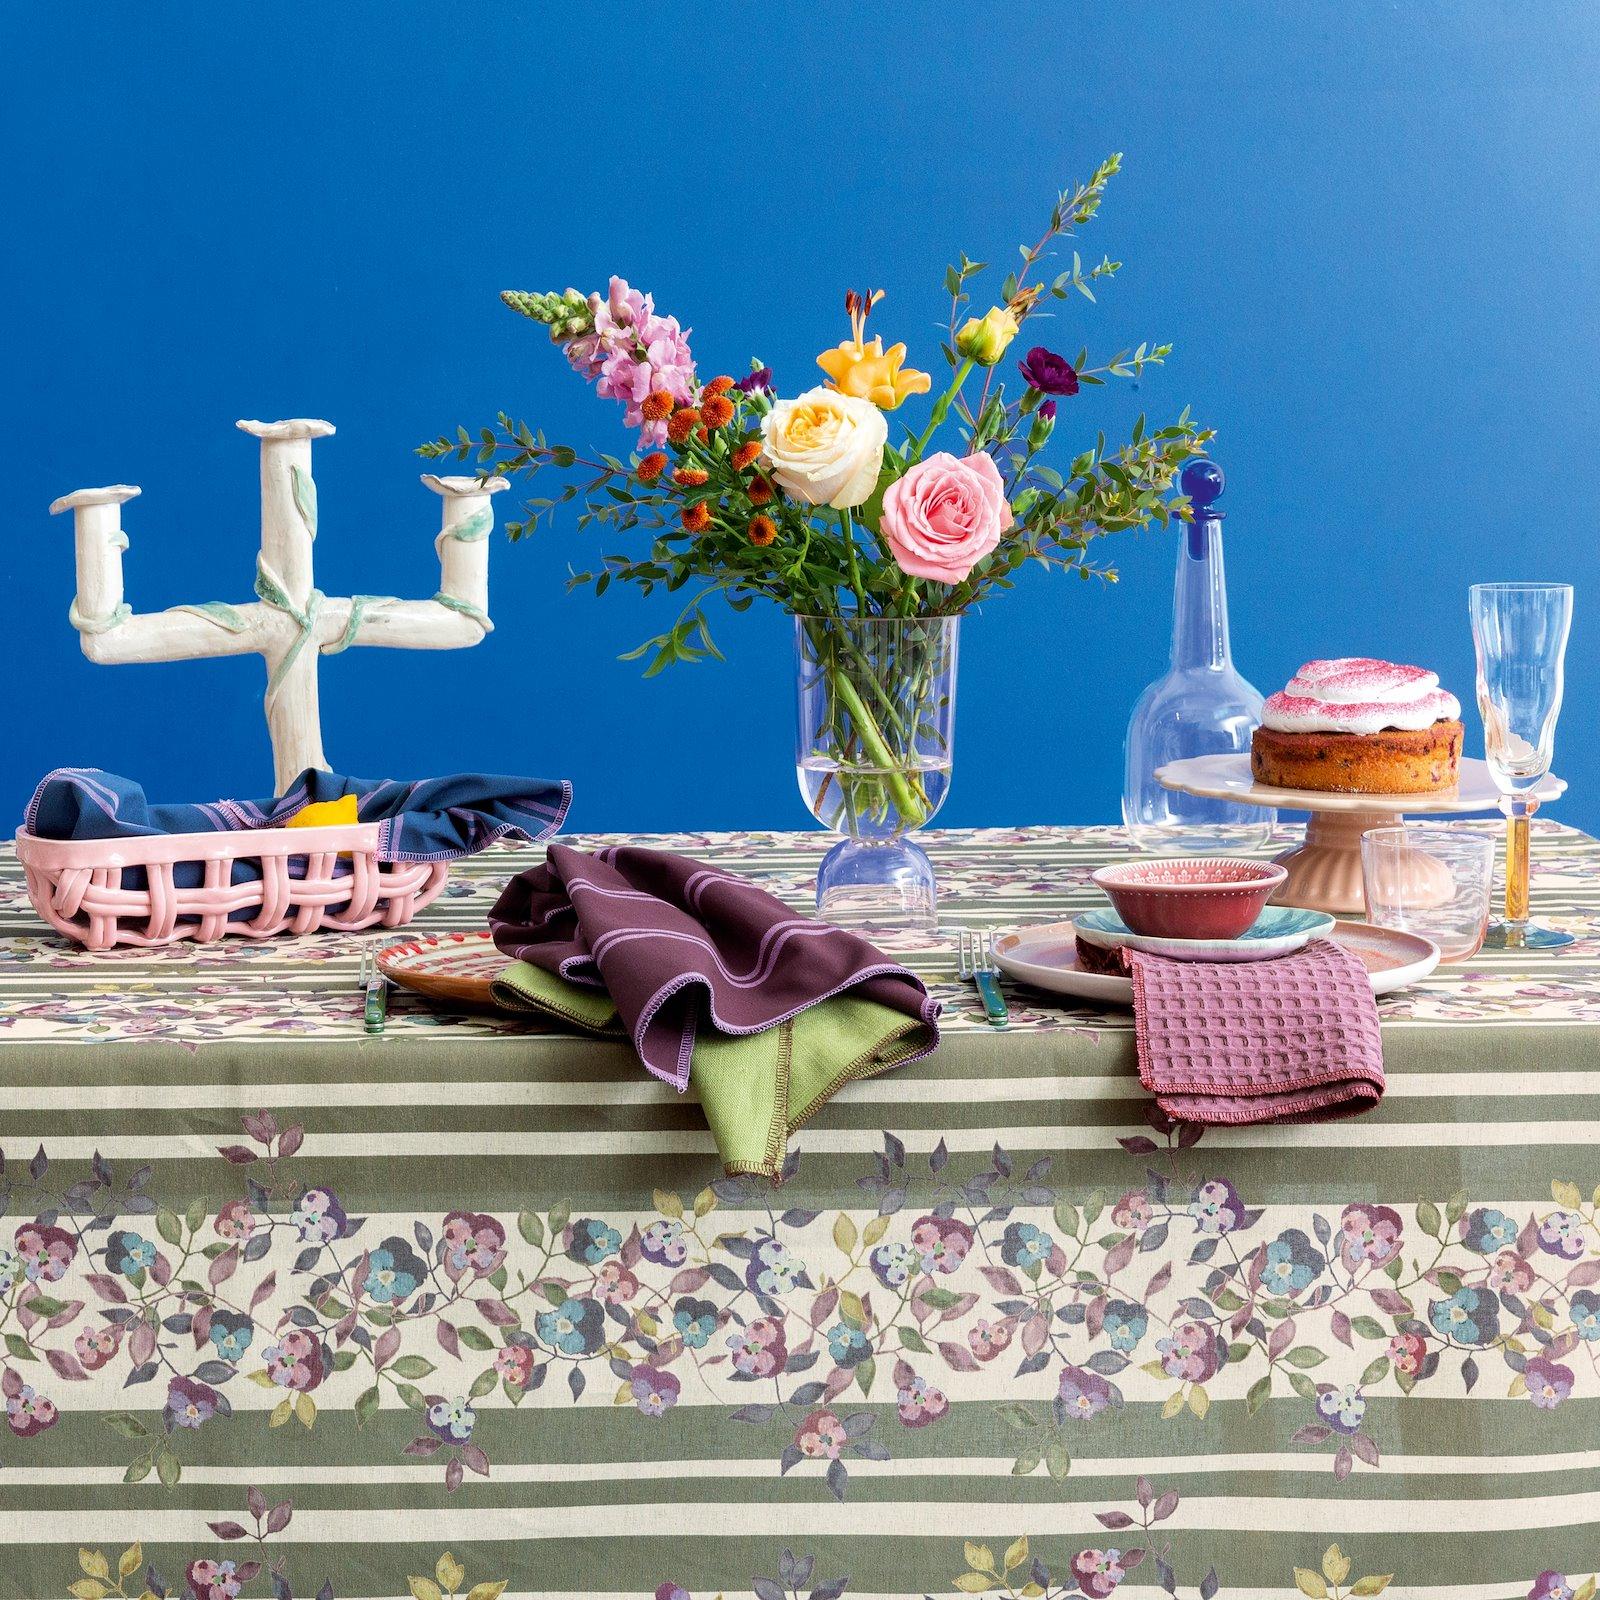 Woven cotton/linen green/rose w flowers 780576_816255_852312_501887_816223_bundle